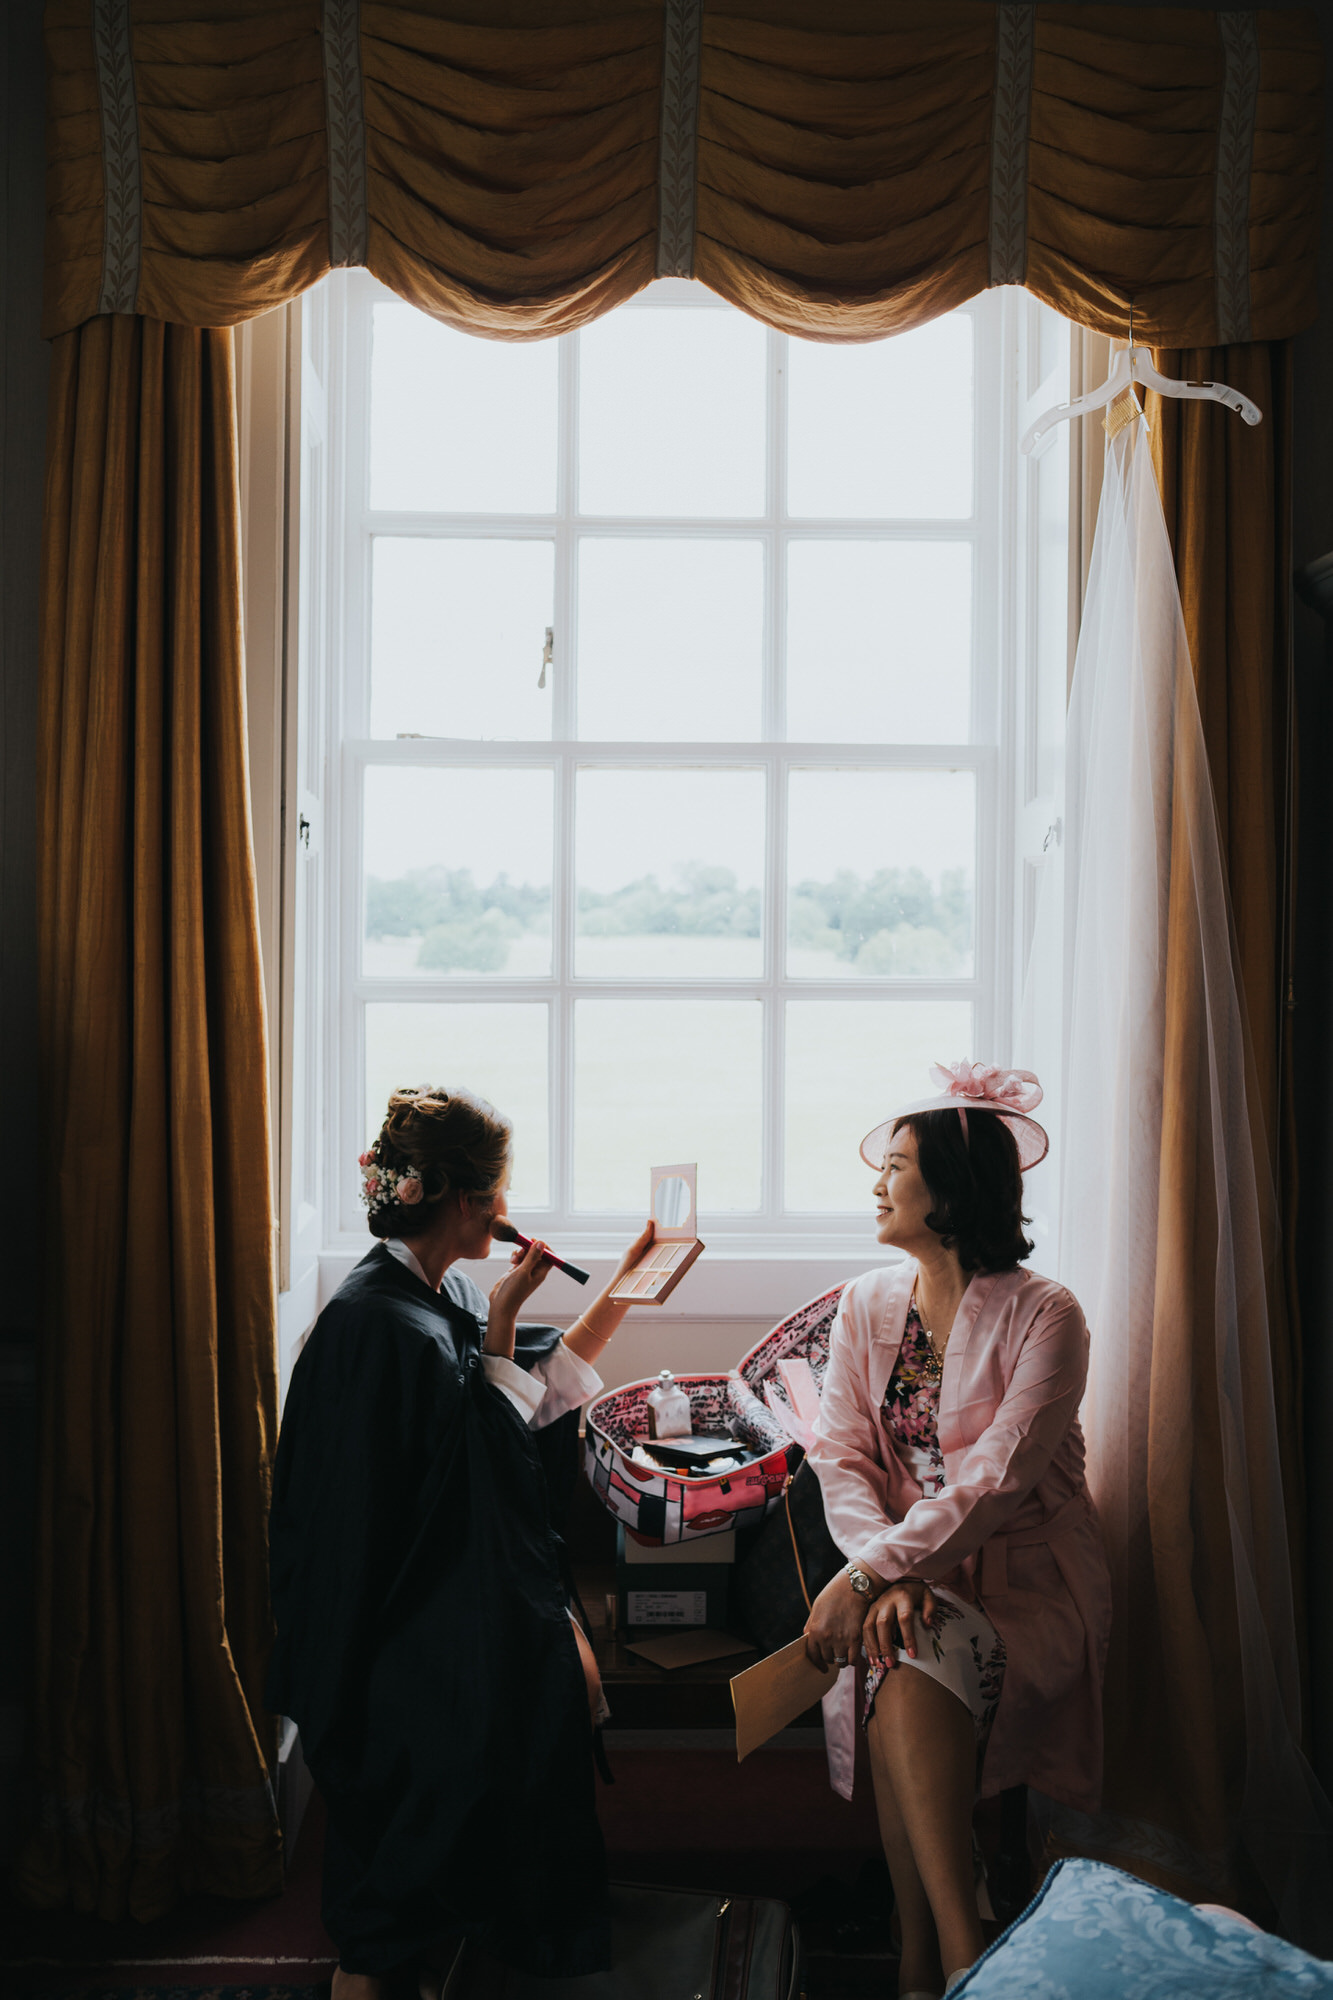 Kirtlington park bridal preparations